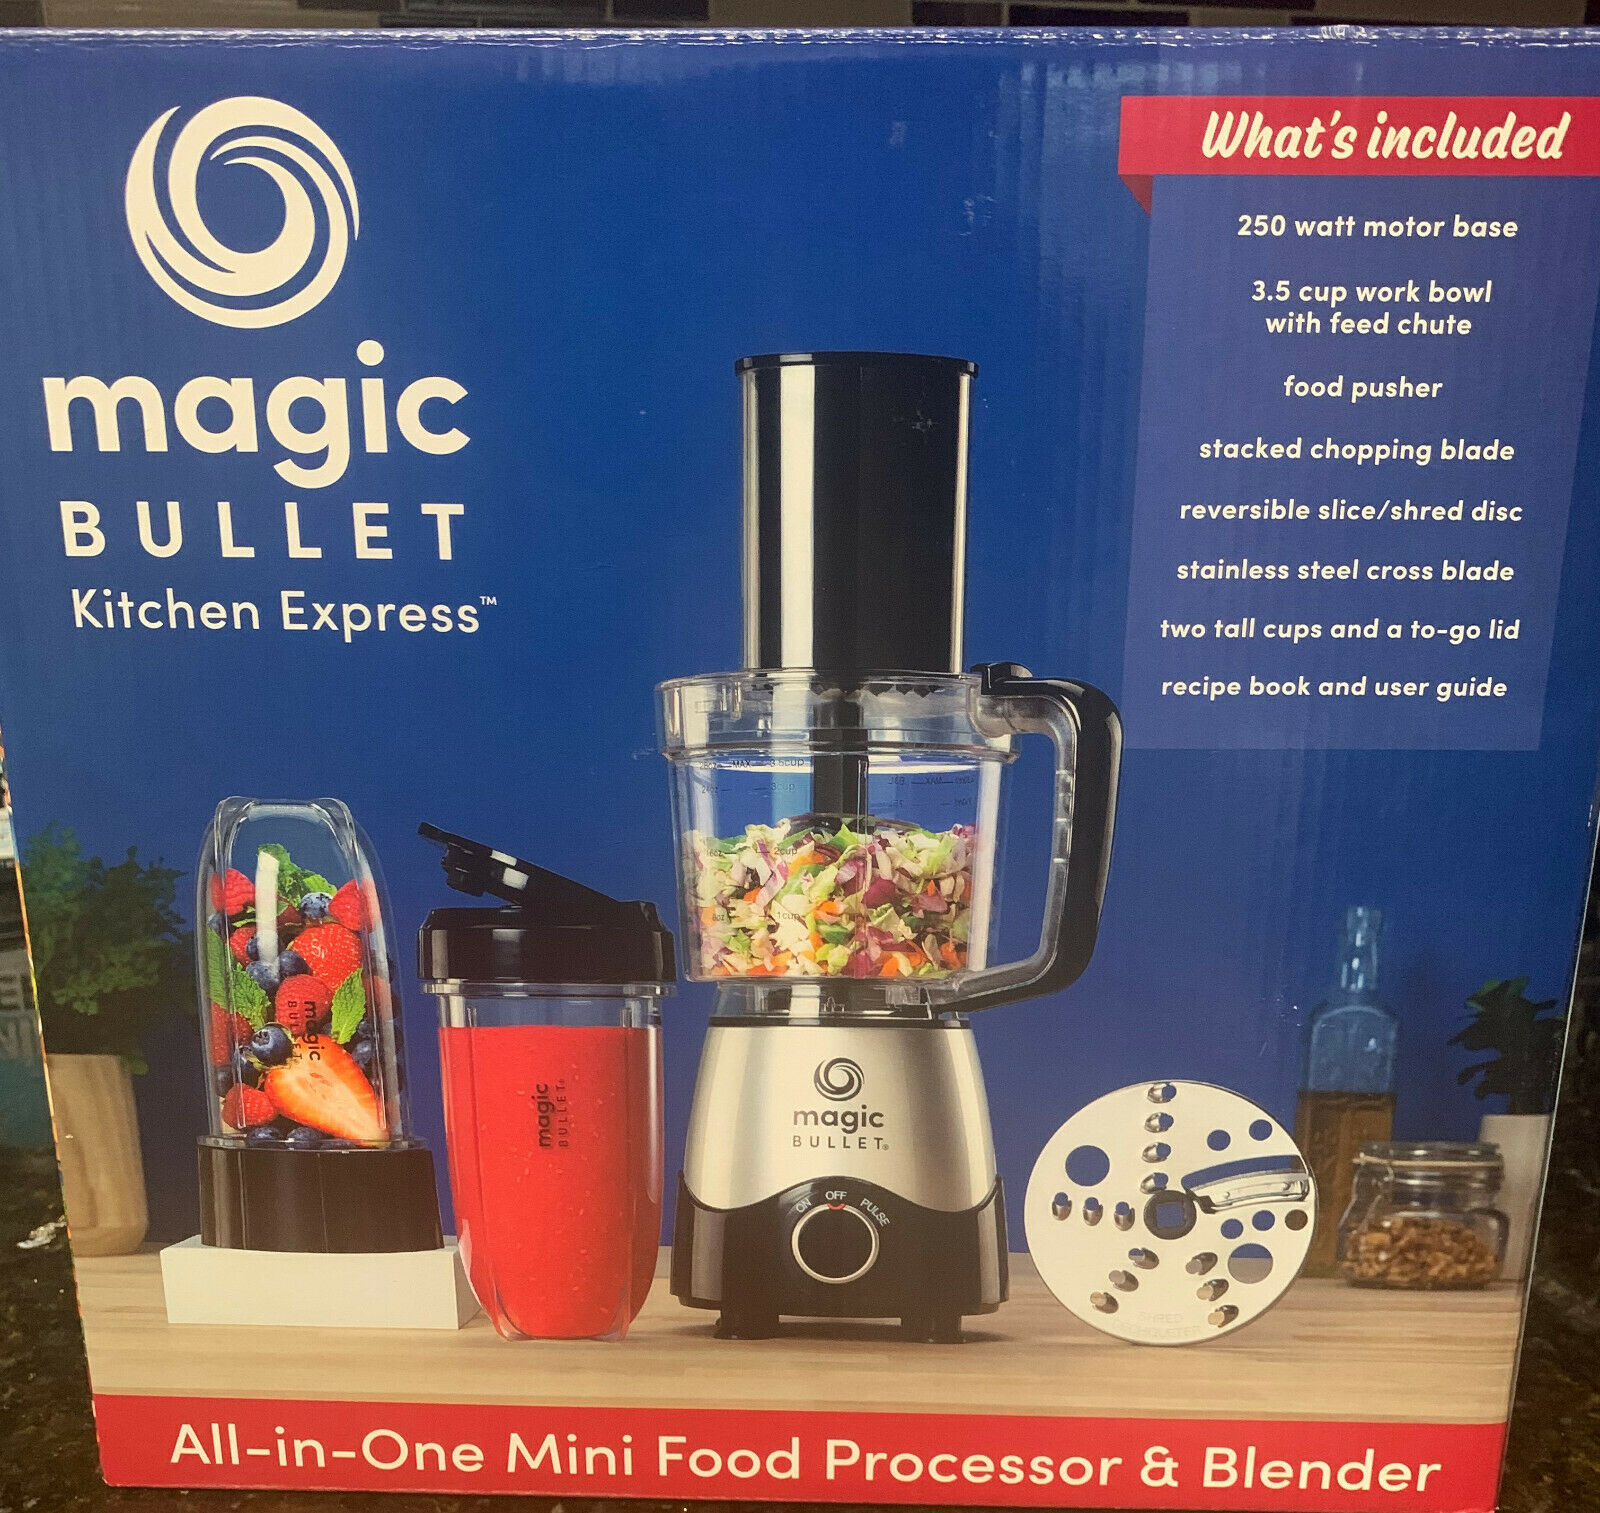 New Magic Bullet Kitchen Express All-in-One Mini Food Processor